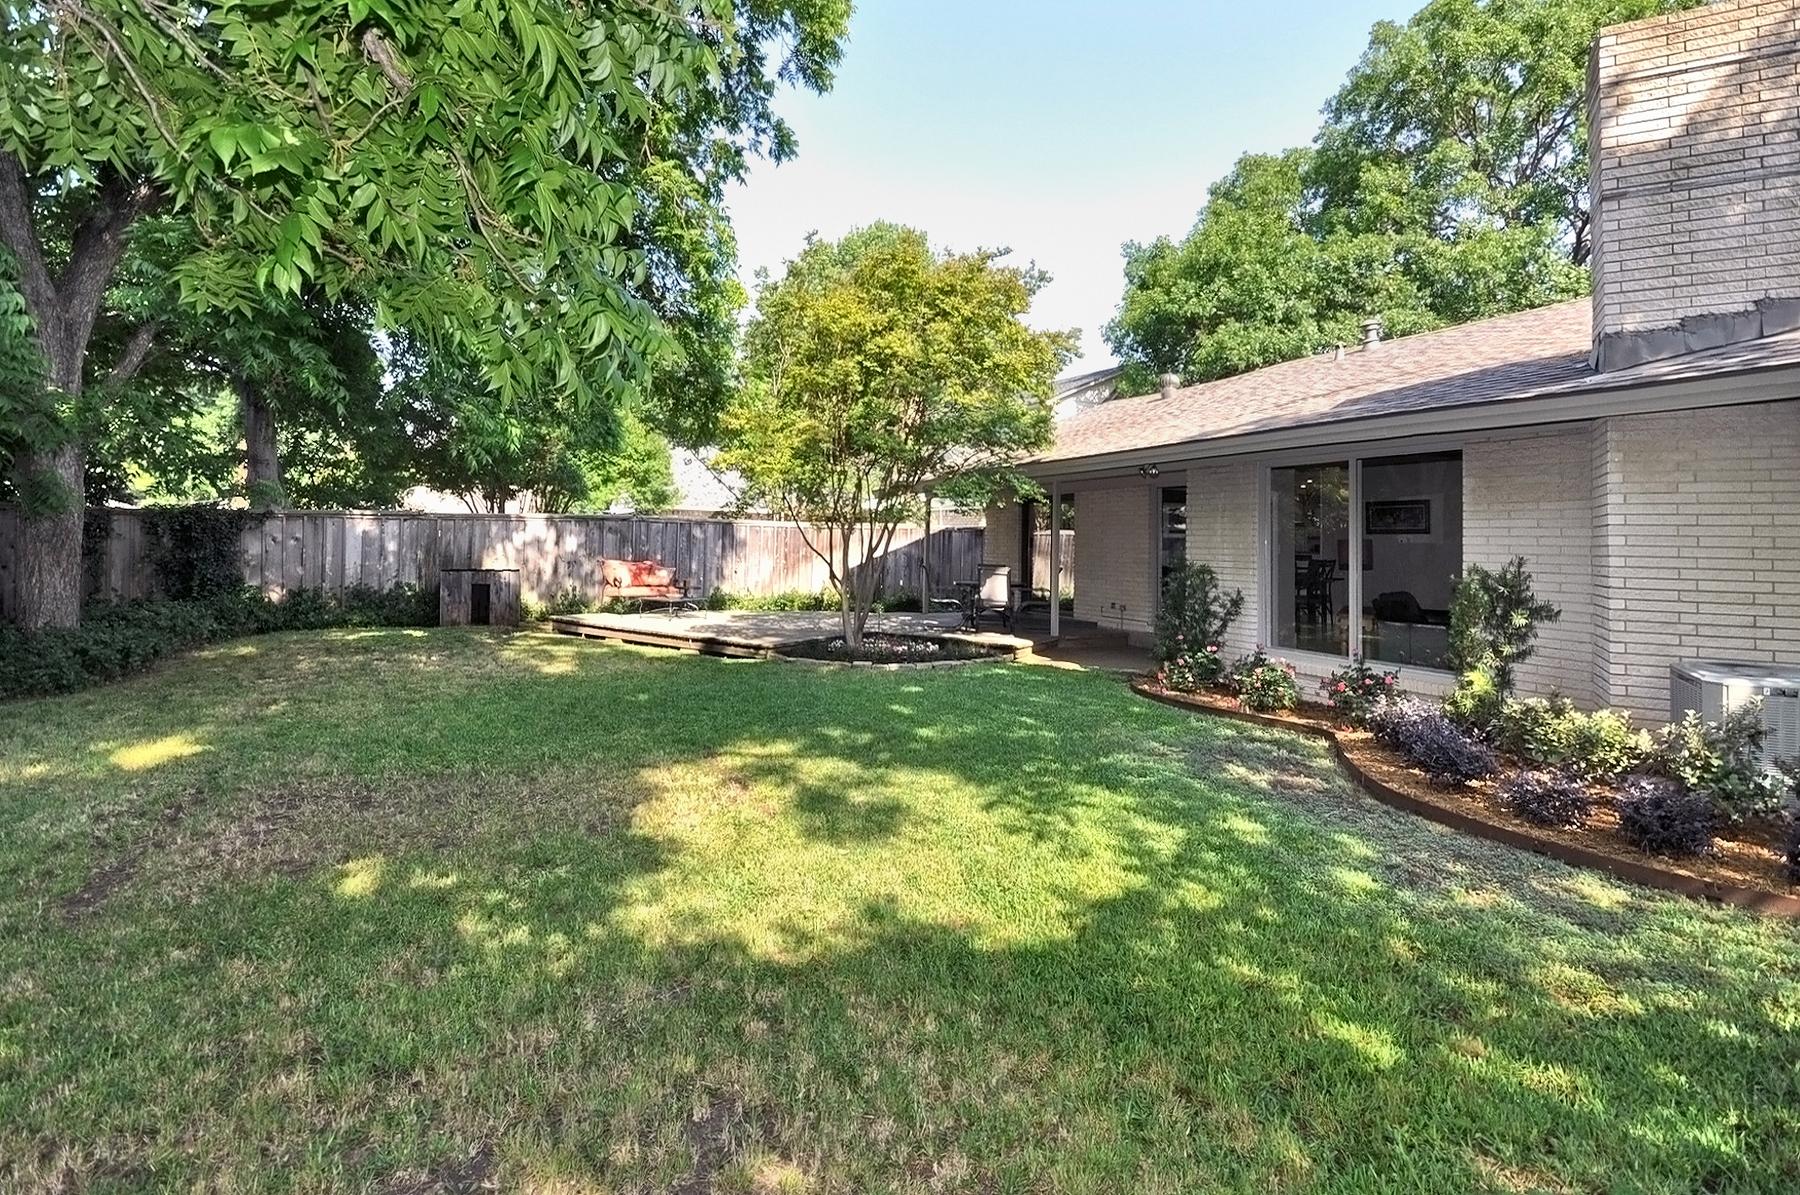 3350 Valiant Dallas Back Yard Grassy Area.jpg